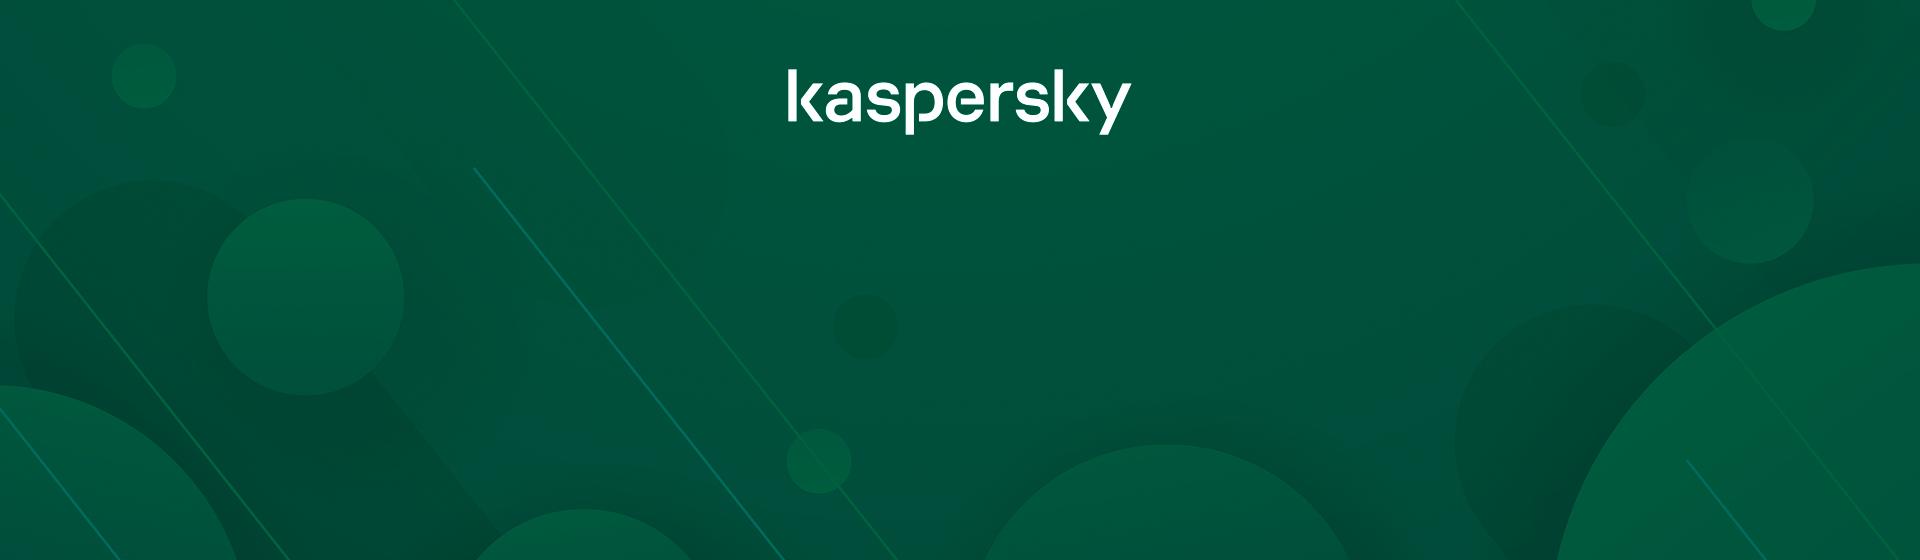 Kaspersky bg